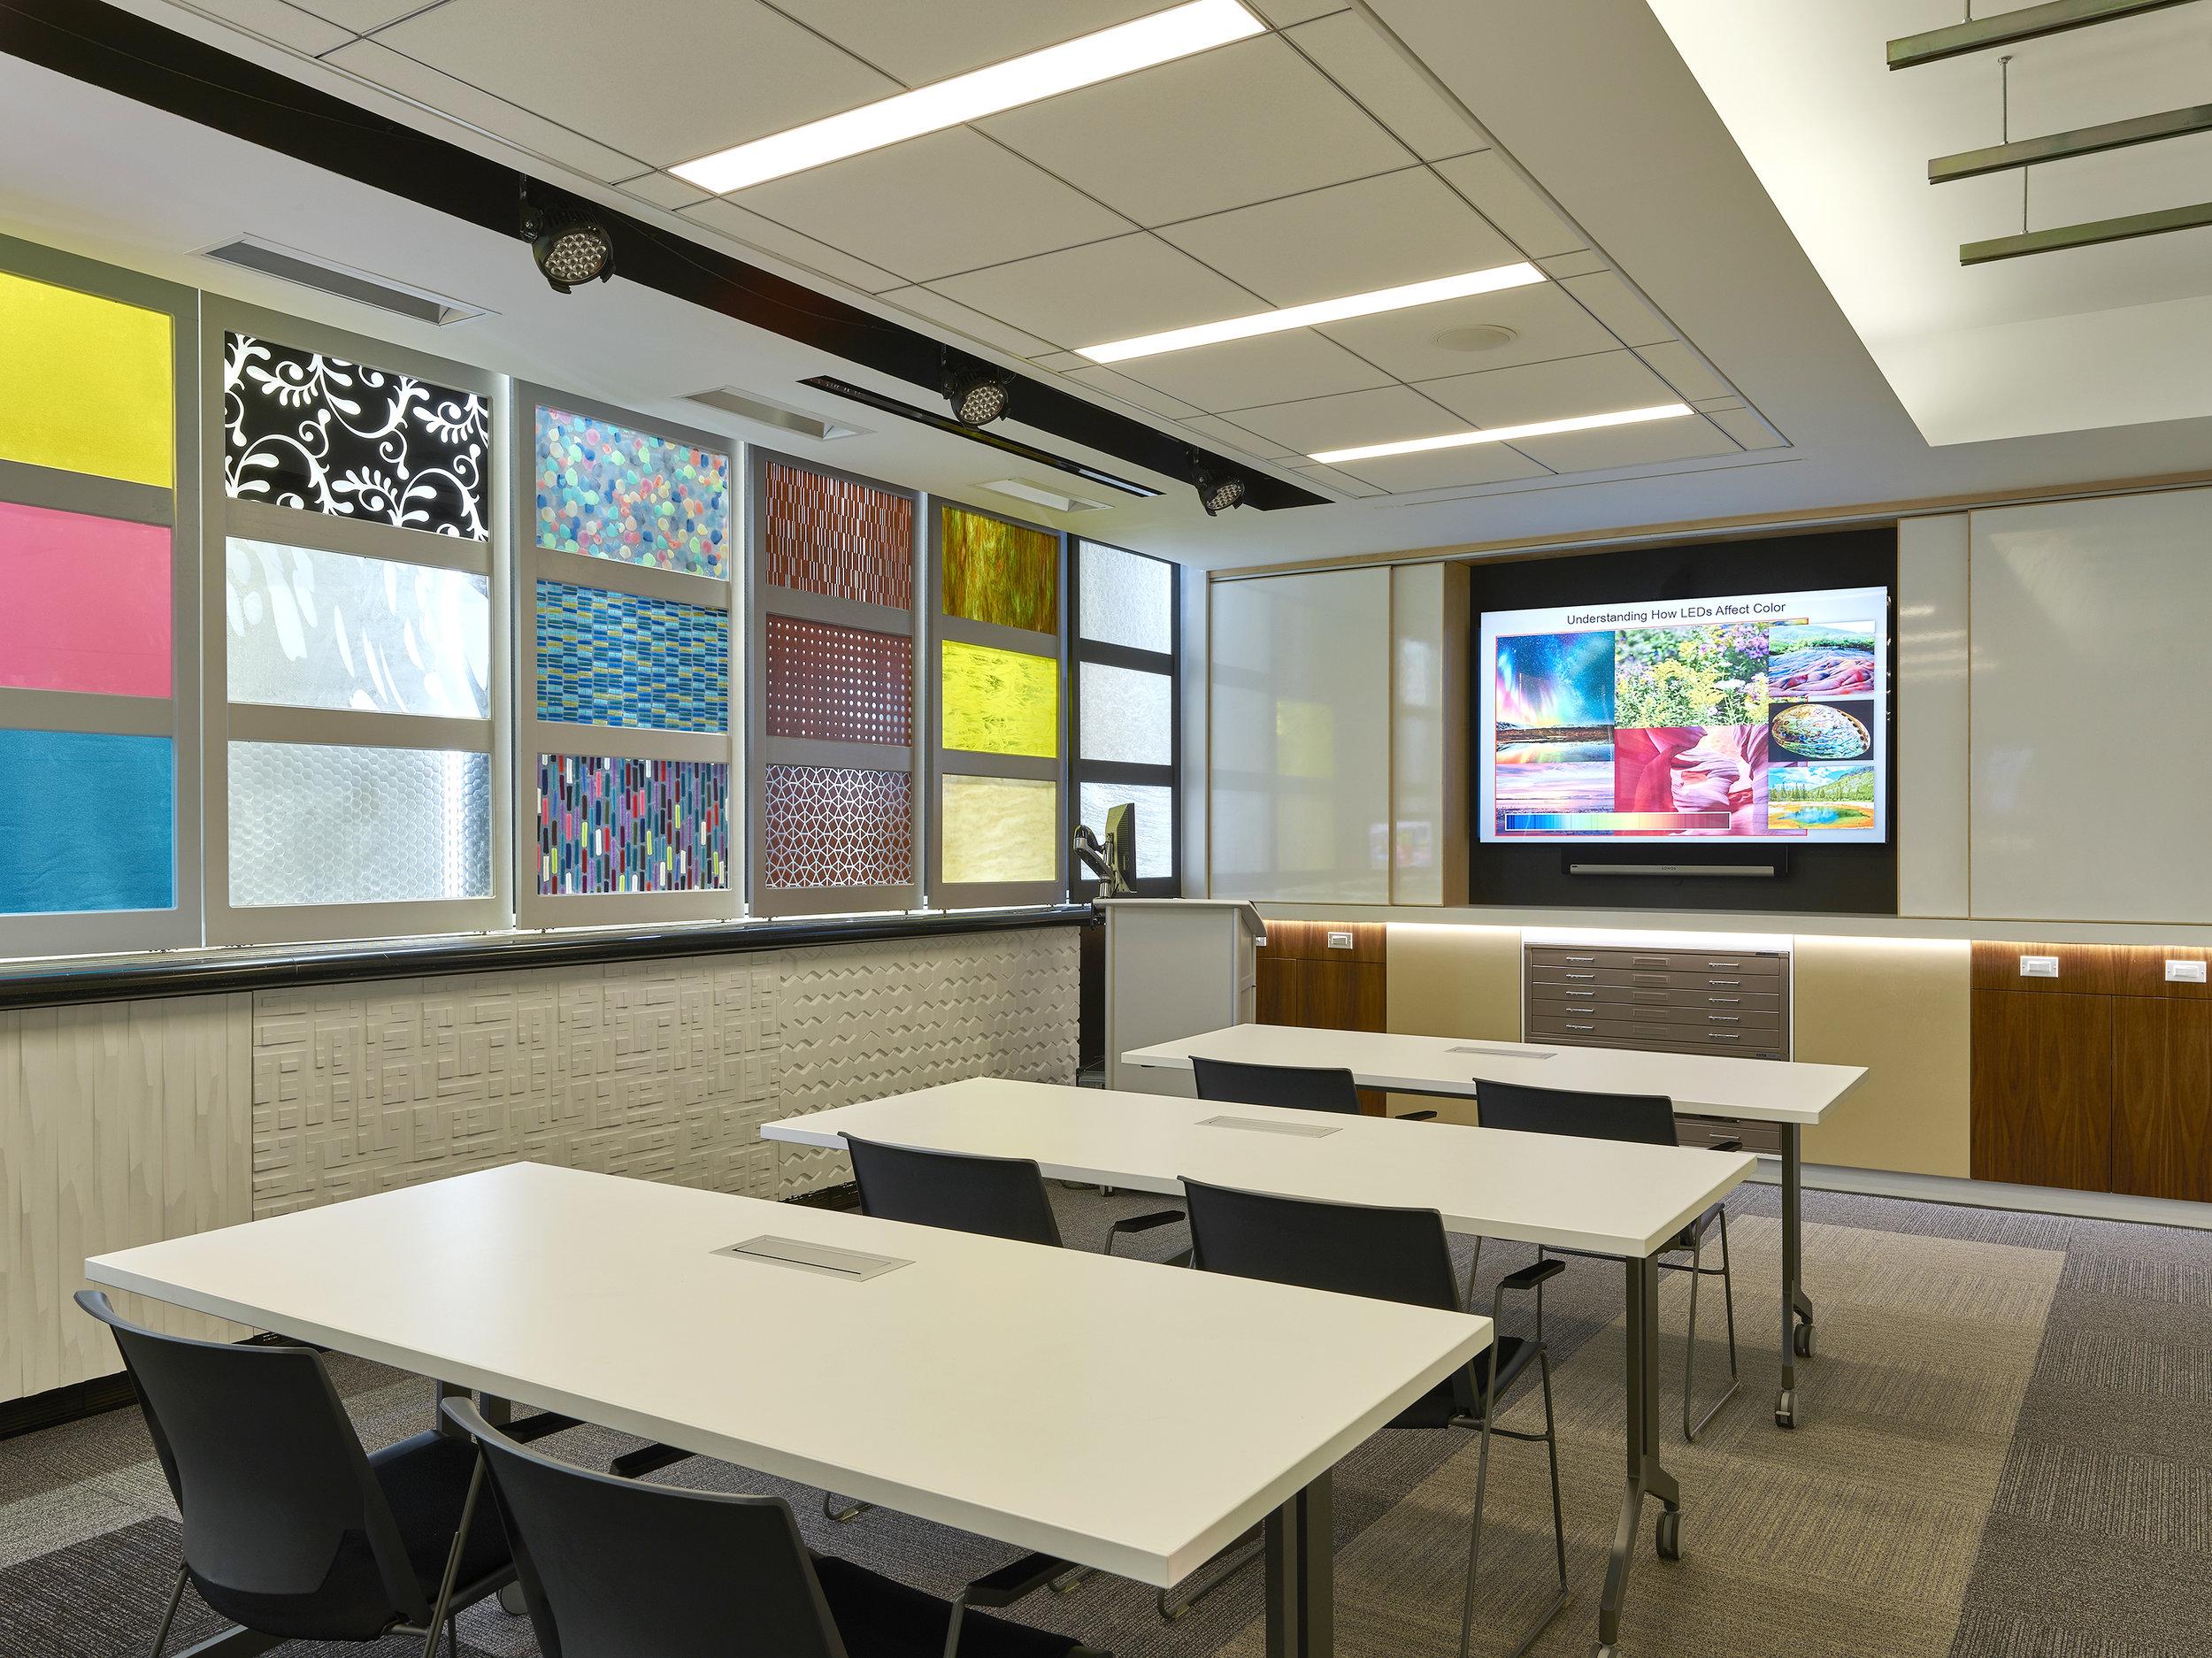 Master Of Professional Studies In Lighting Design New York School